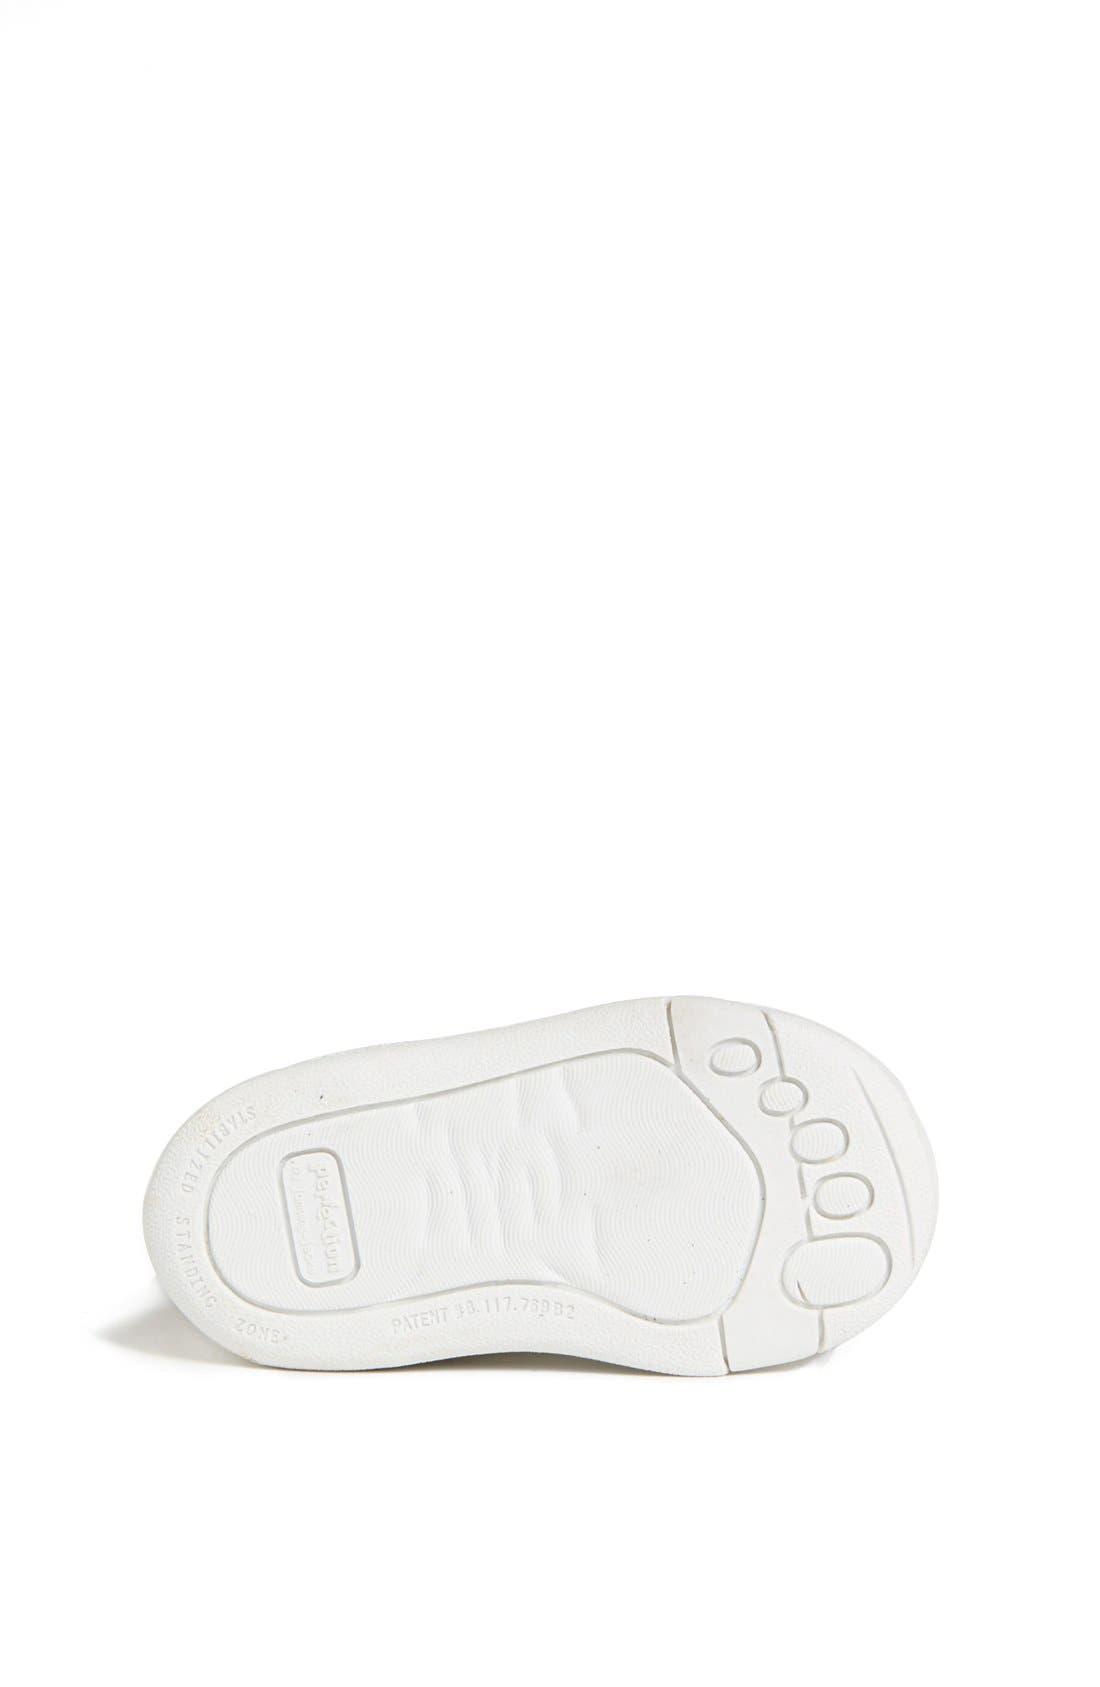 'Perfection' Sneaker,                             Alternate thumbnail 2, color,                             100